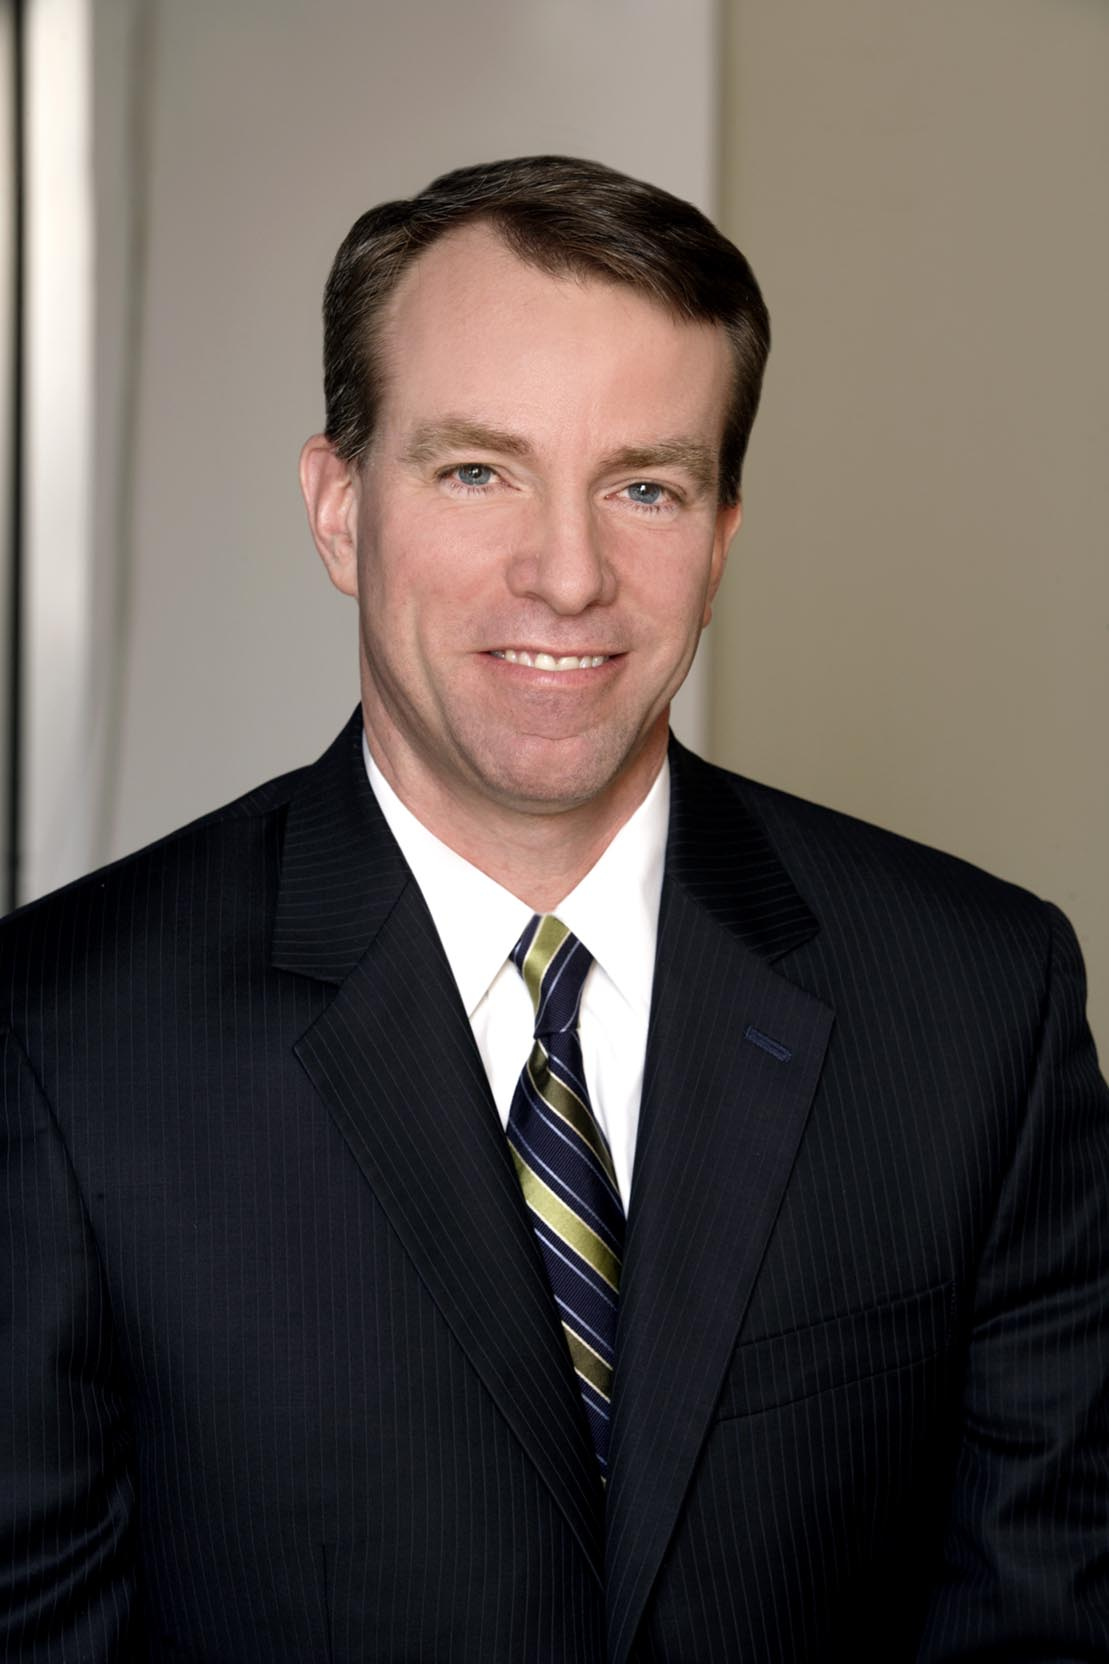 Neil Murray - Personal Injury Lawyer